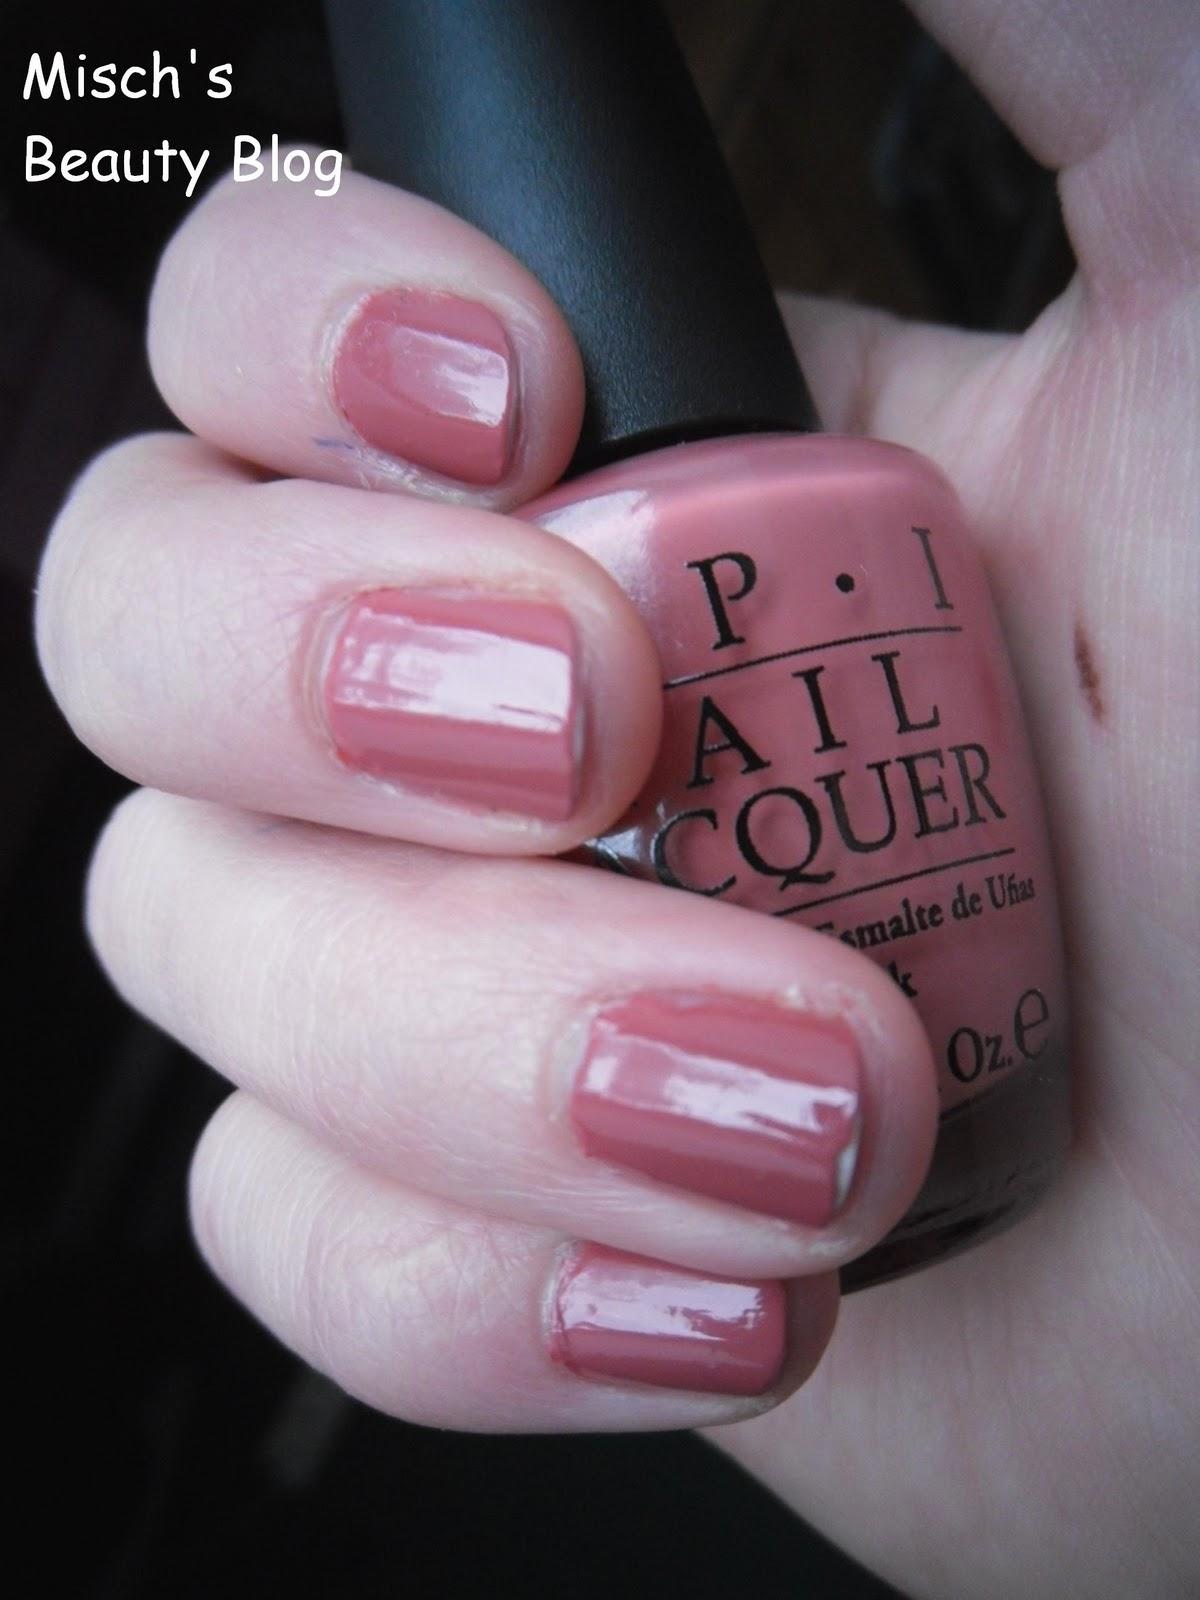 Misch S Beauty Blog Notd September 29th Fall Leaf Nail Art: Misch's Beauty Blog: NOTD January 31st: OPI